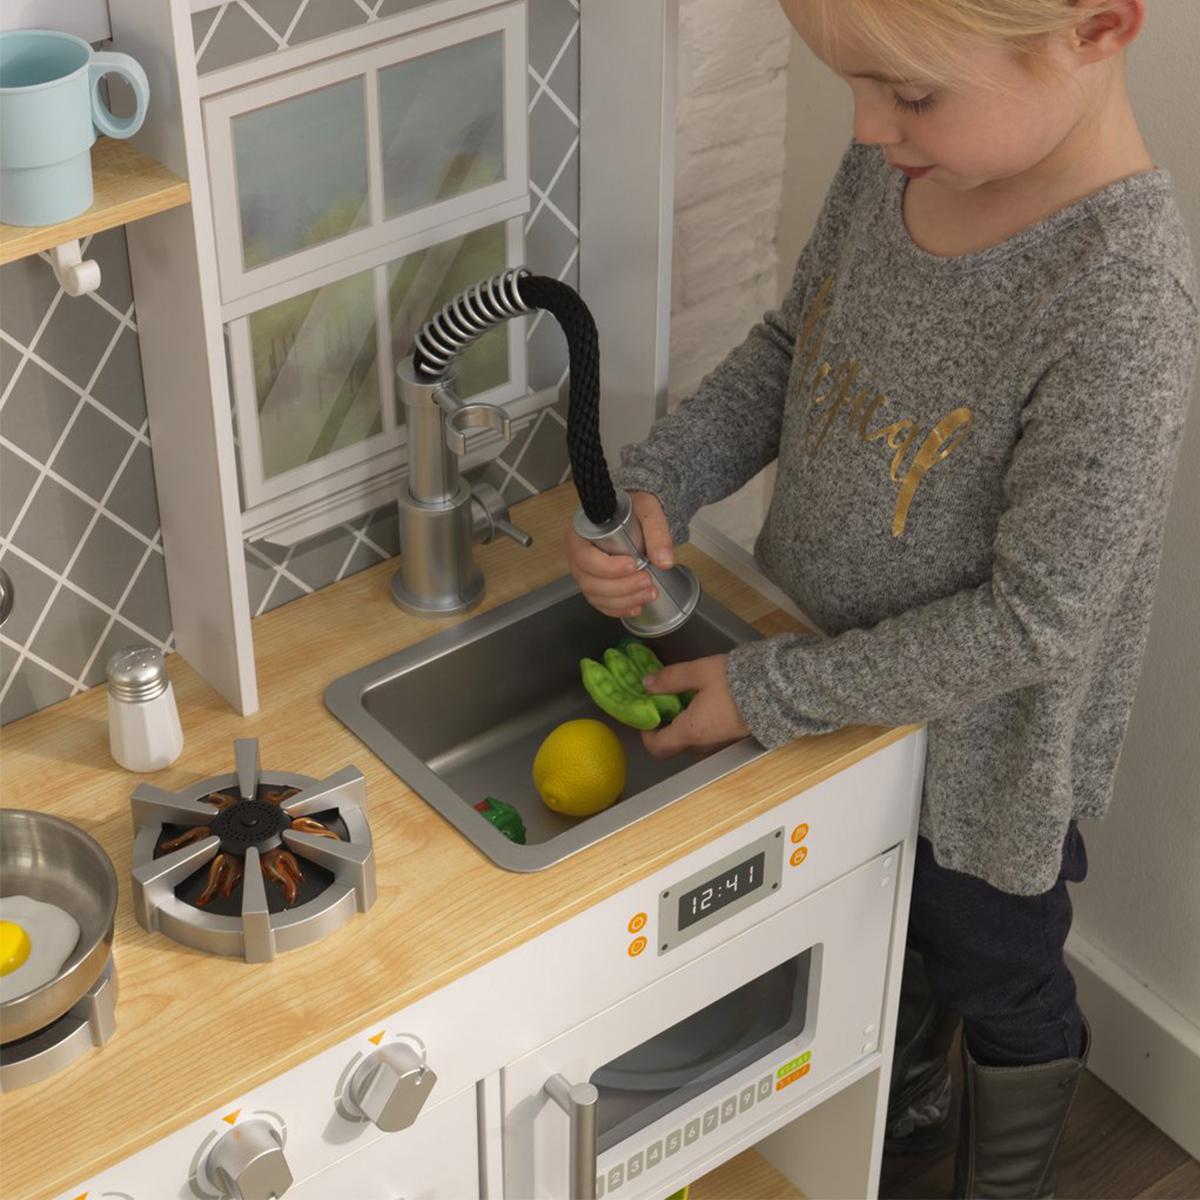 KidKraft kuhinja Hajde da kuvamo